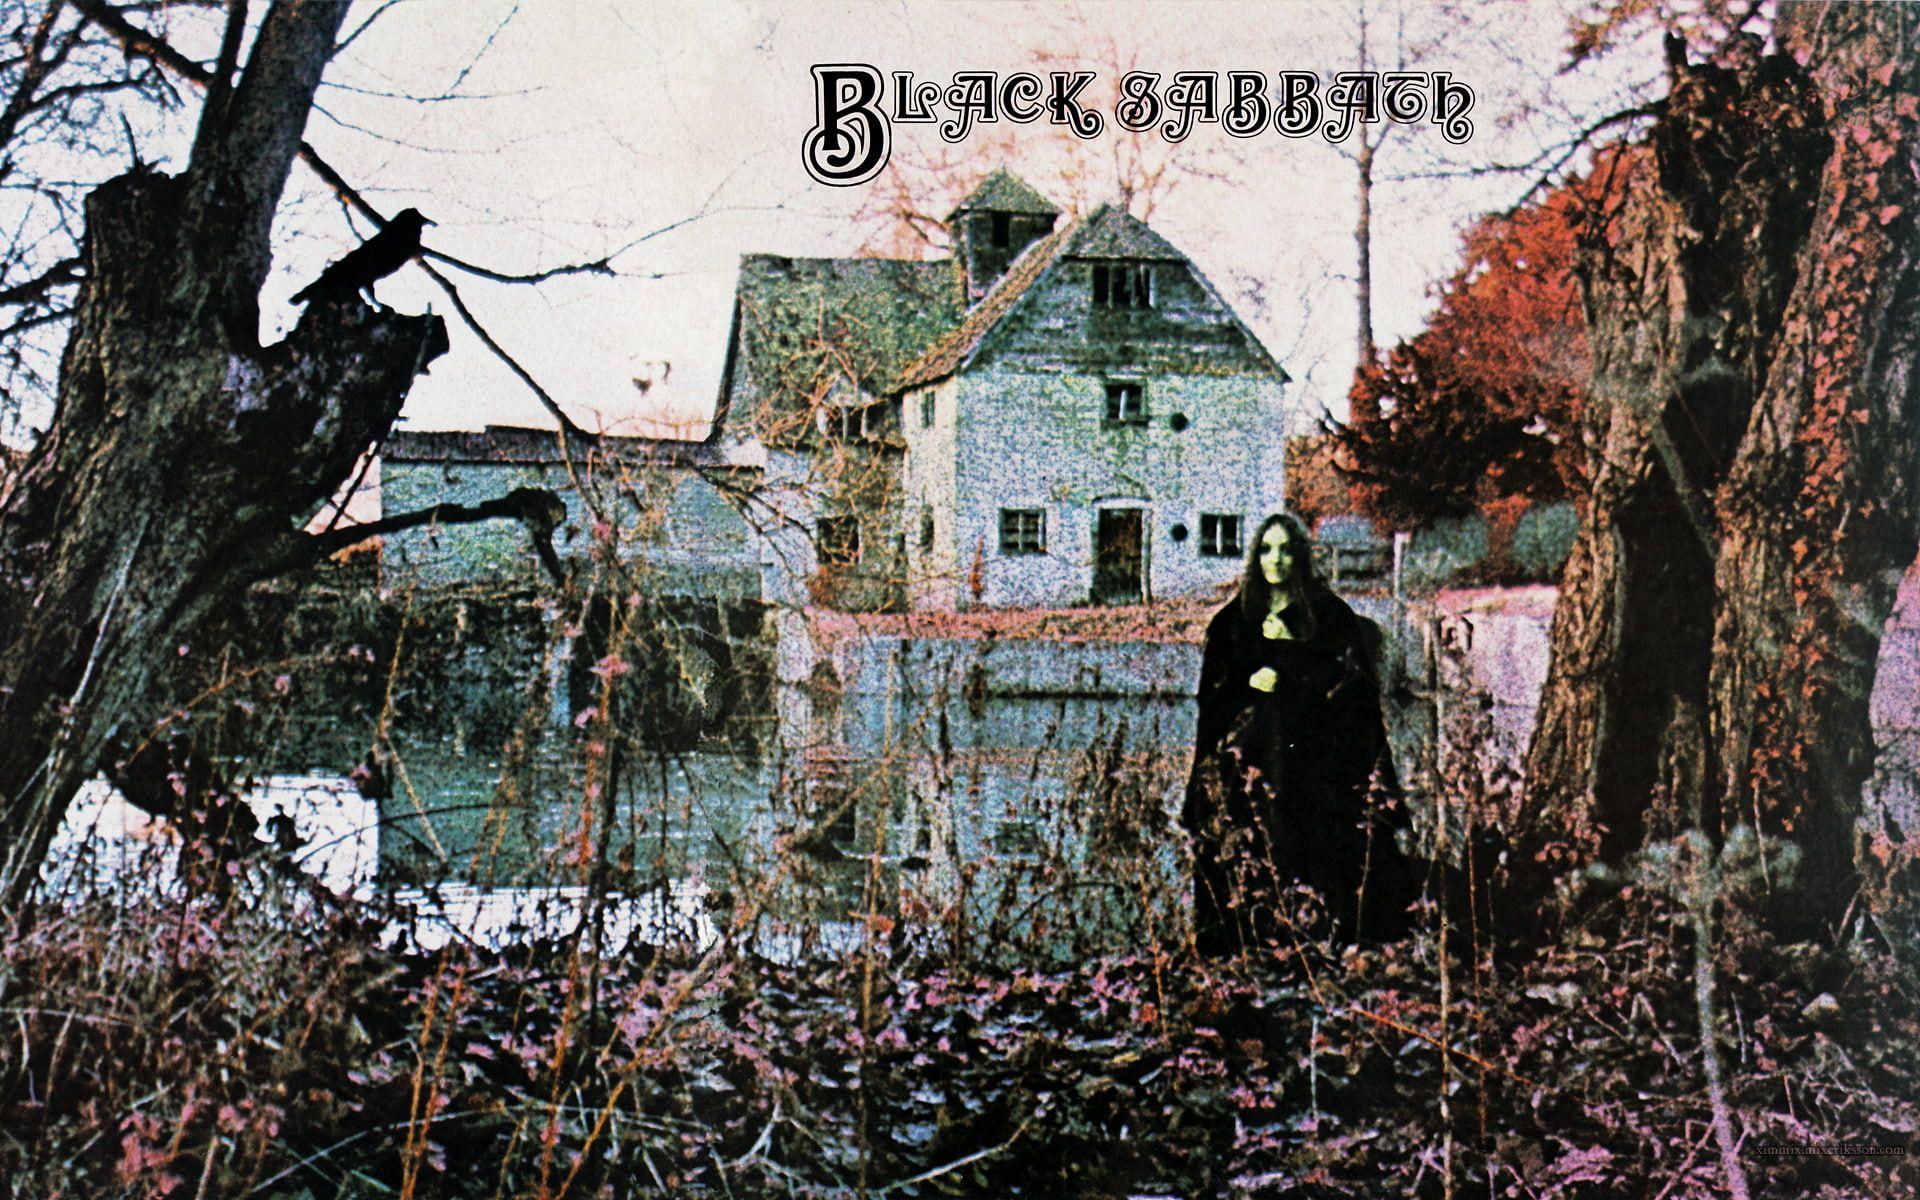 Black Sabbath Hd Black Music Sabbath 1080p Wallpaper Hdwallpaper Desktop